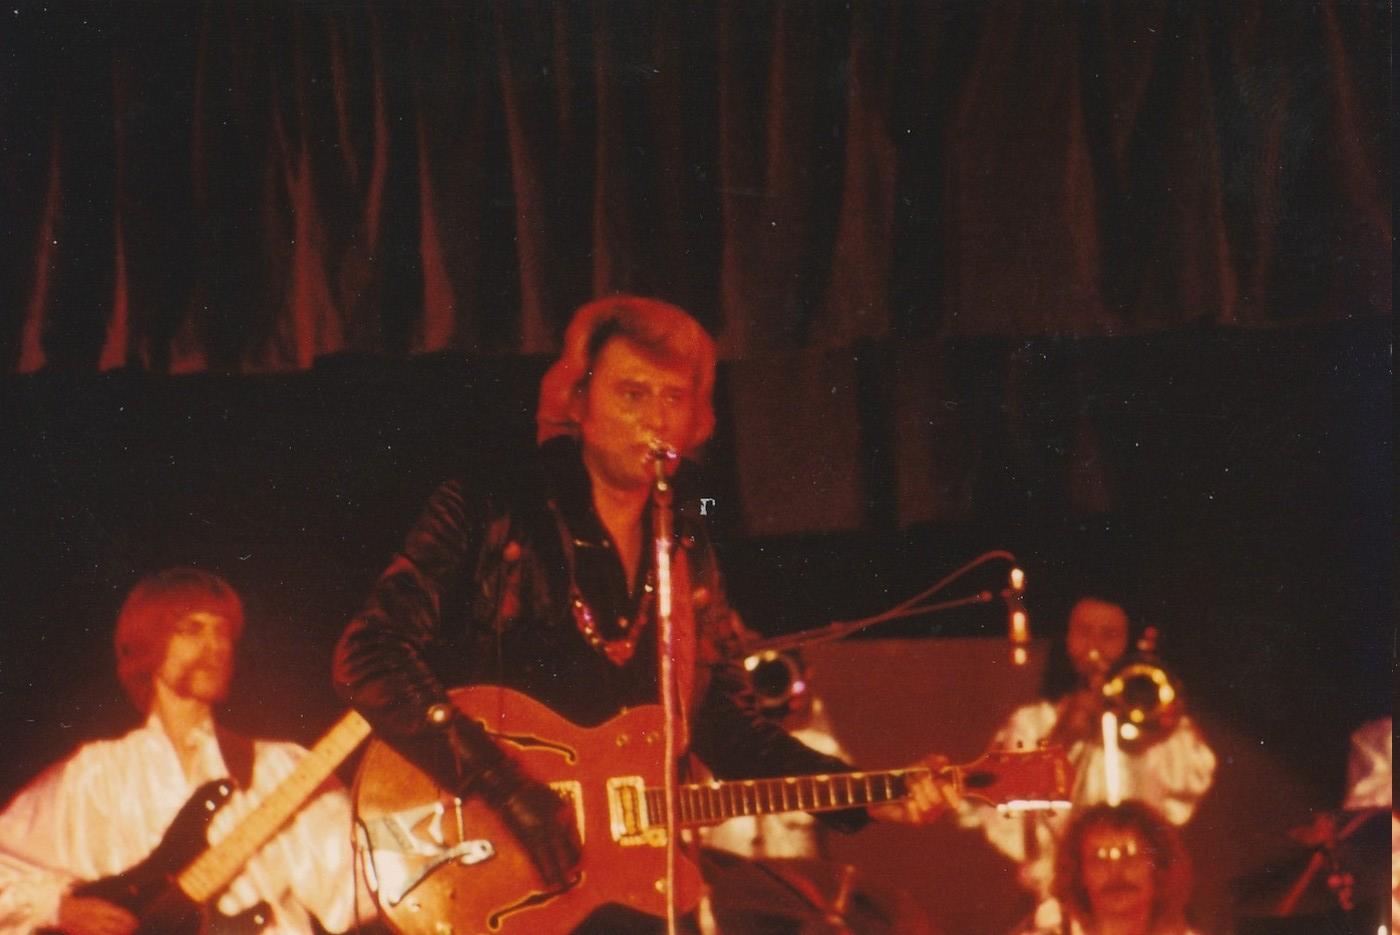 INÉDIT  :  JOHNNY HALLYDAY EN TOURNEE - HIVER 1978 -1979 ( PHOTOS INÉDITES )   Img_2634